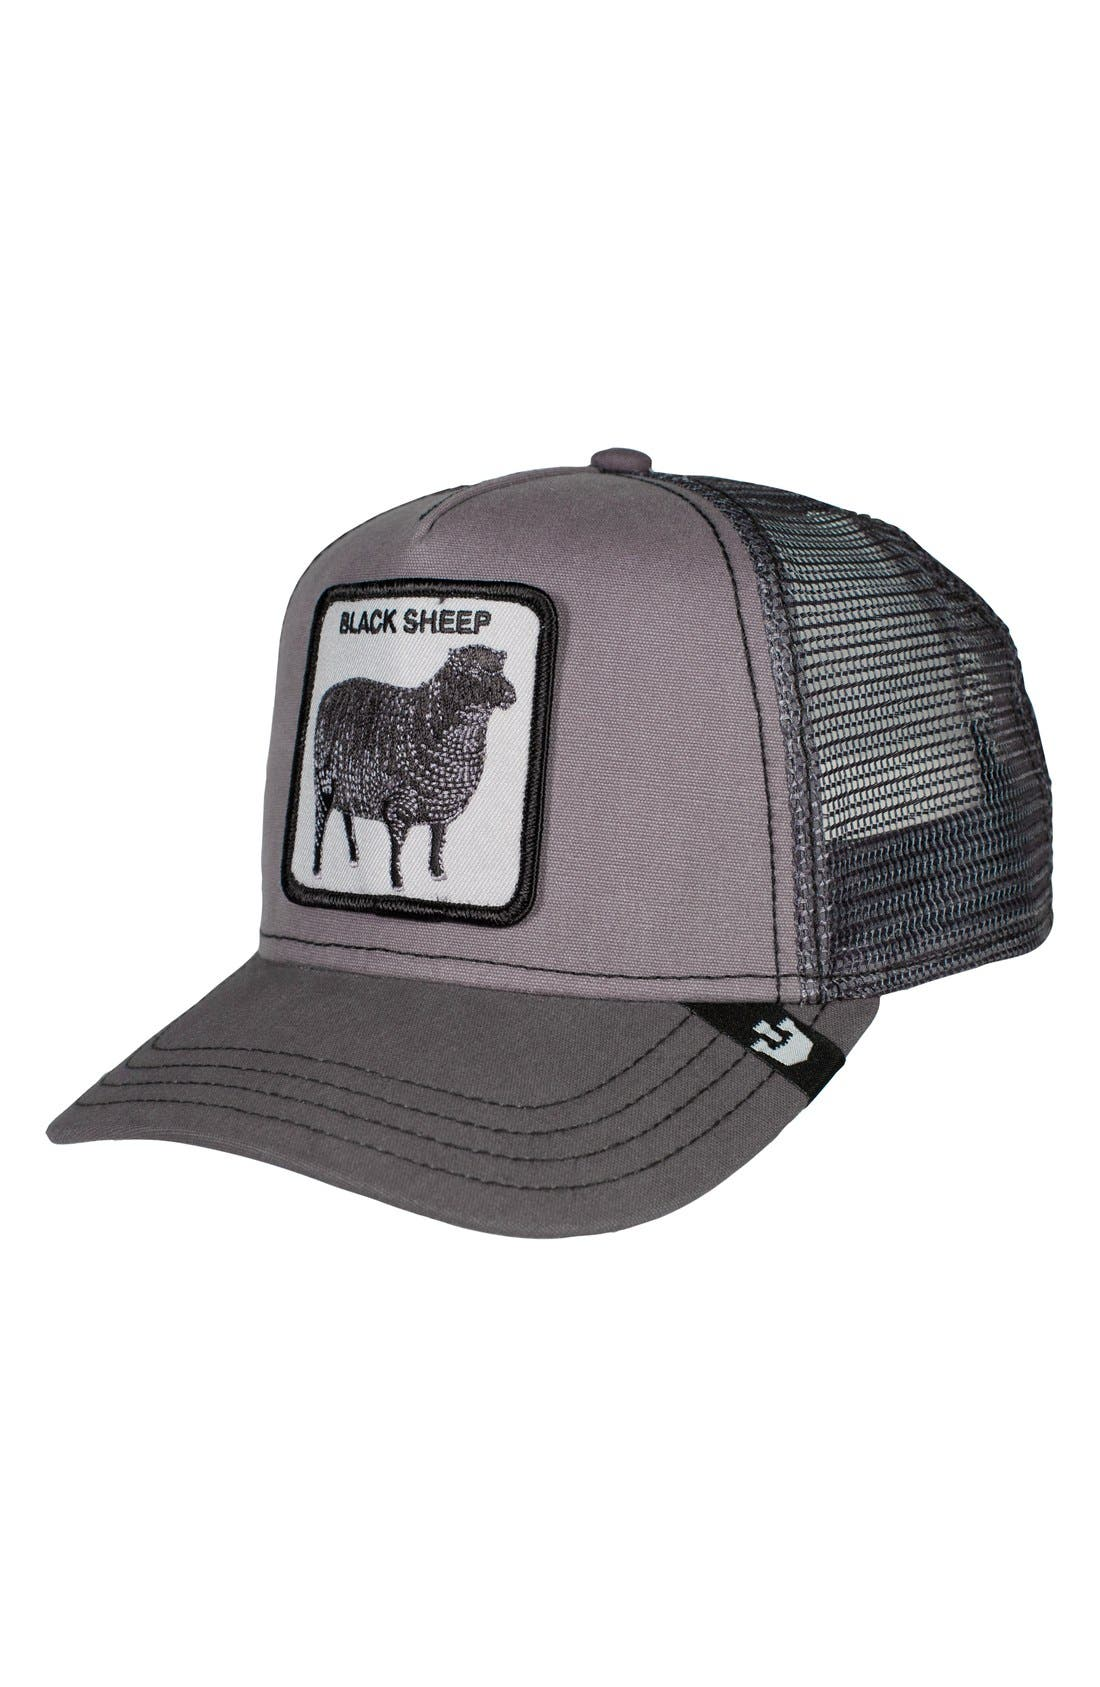 'Shades of Black' Mesh Trucker Hat,                             Main thumbnail 1, color,                             020